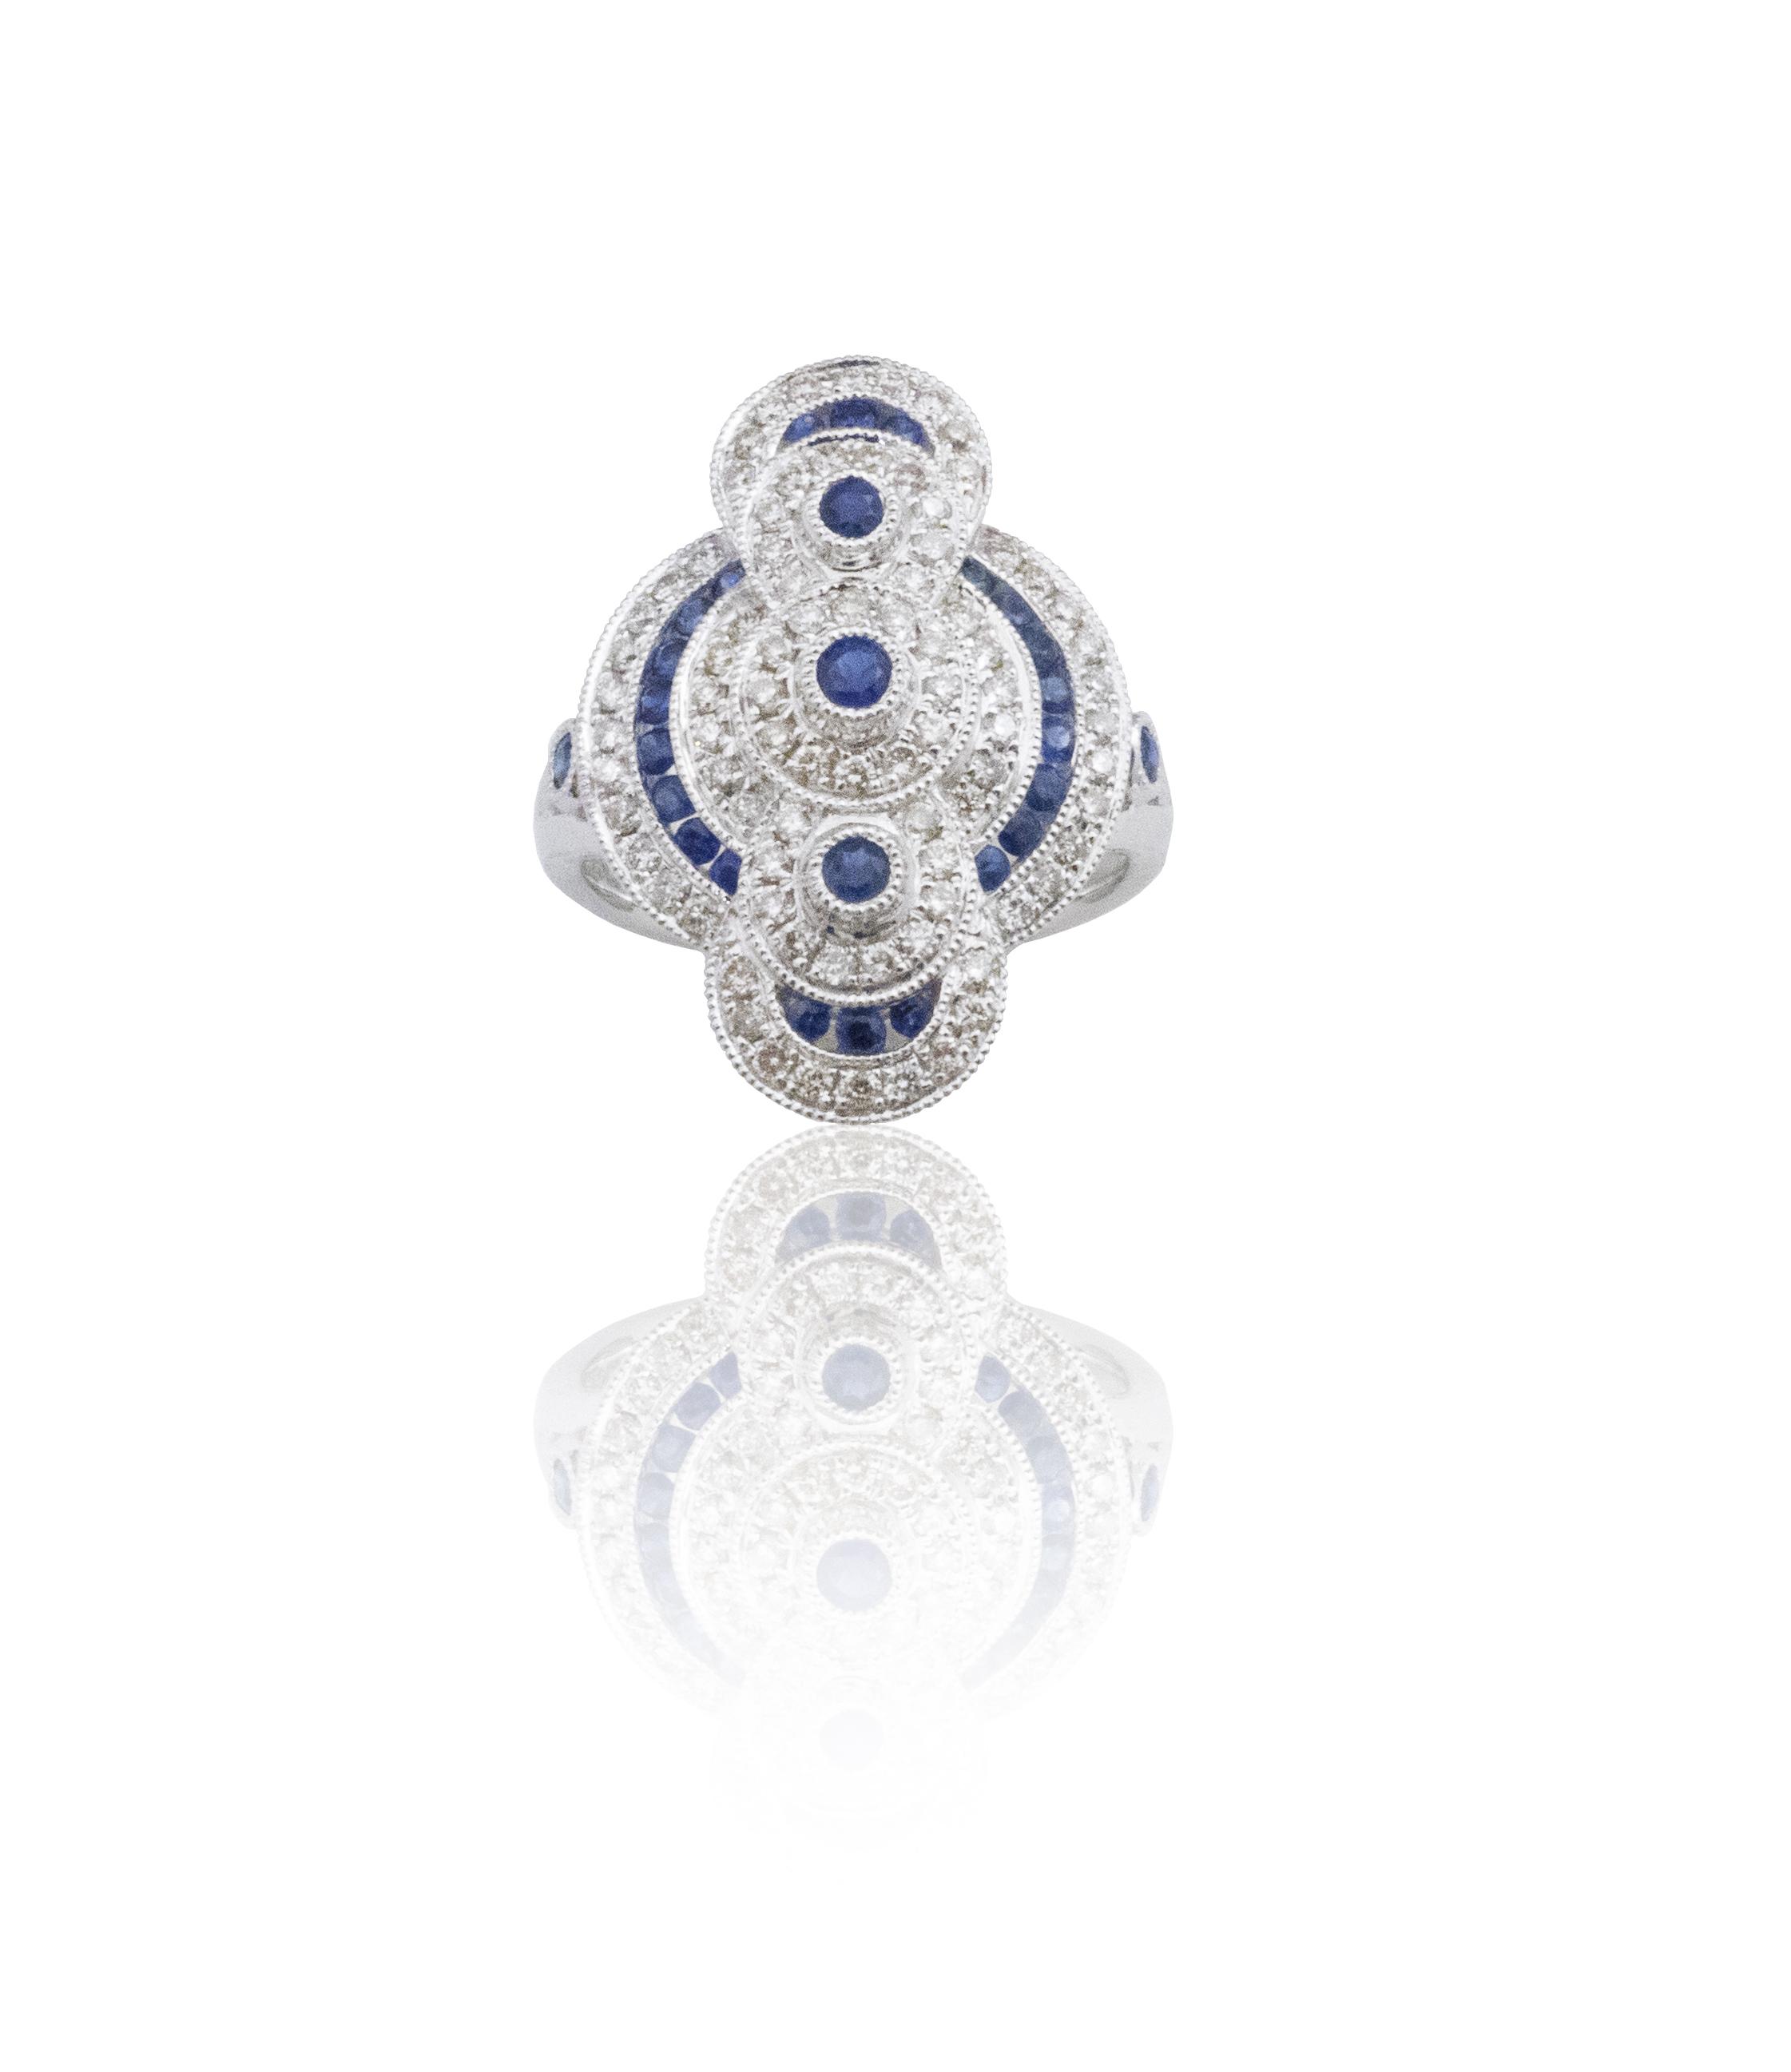 A work of art Sapphire ring!